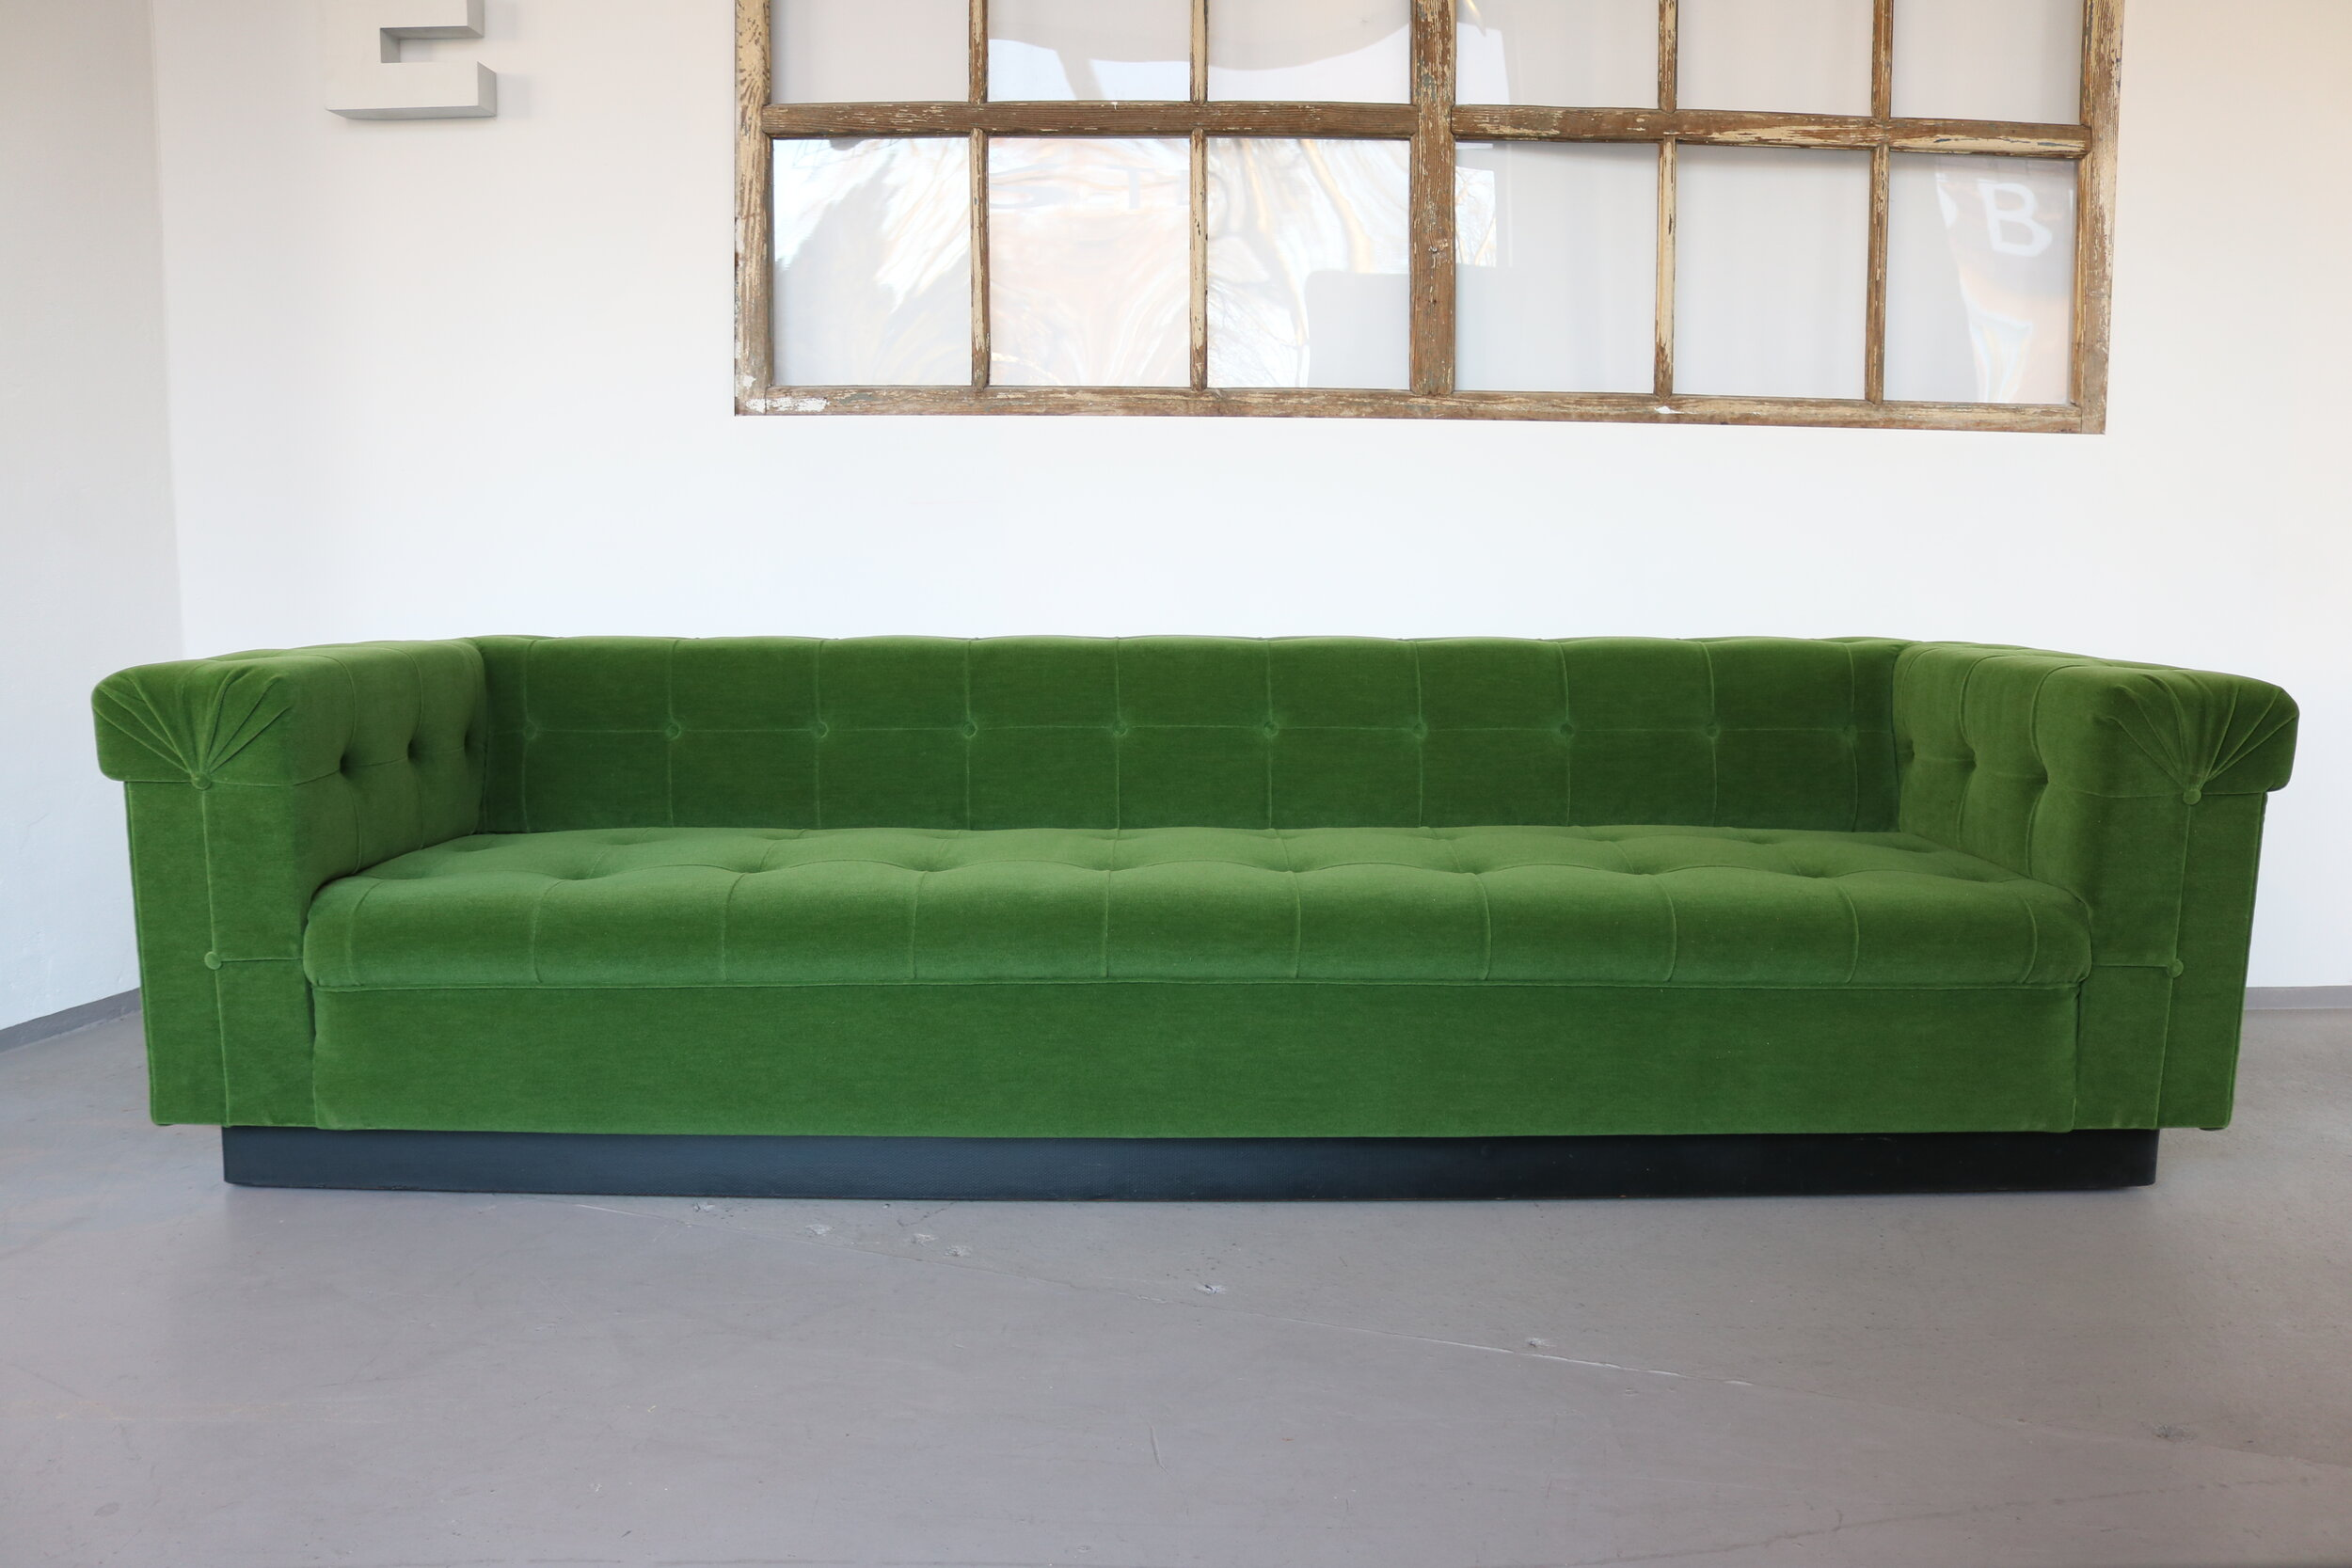 Party Sofa - Edward Wormley